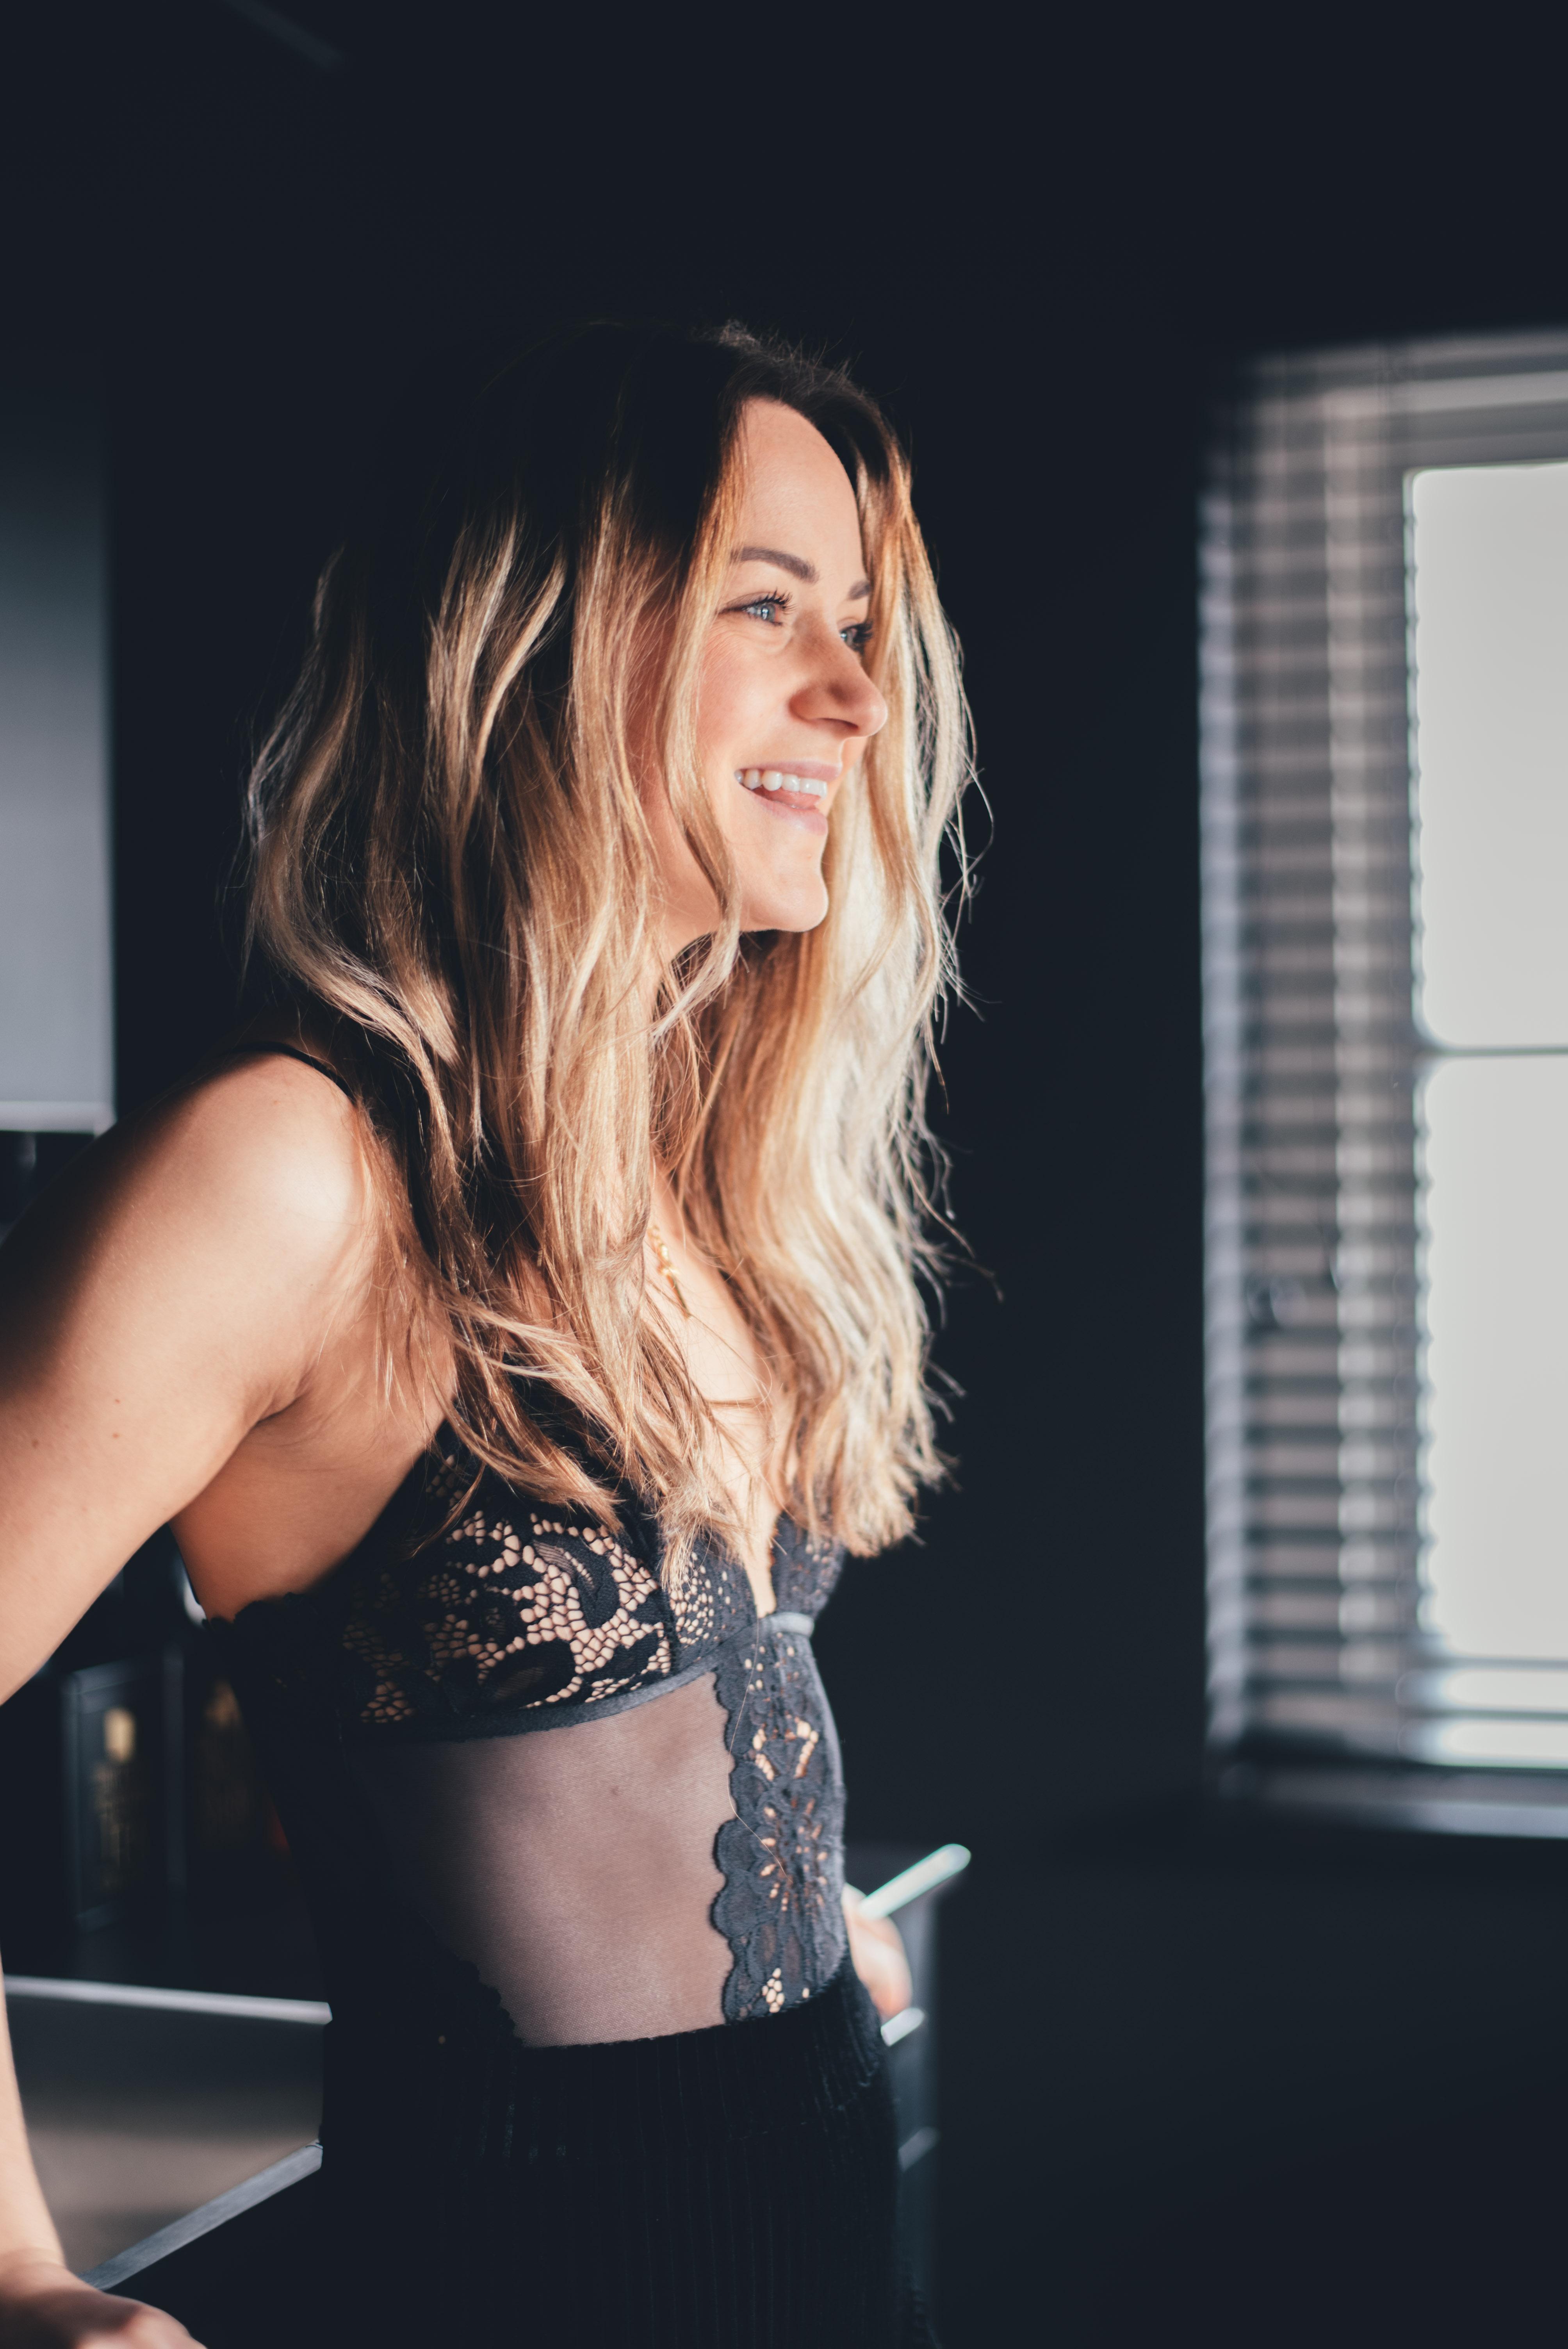 hunkemoller, hunkemöller, lingerie, lace, kant, satijn, satin, ondergoed, braparty, xmariekie, influencer, blog, blogger